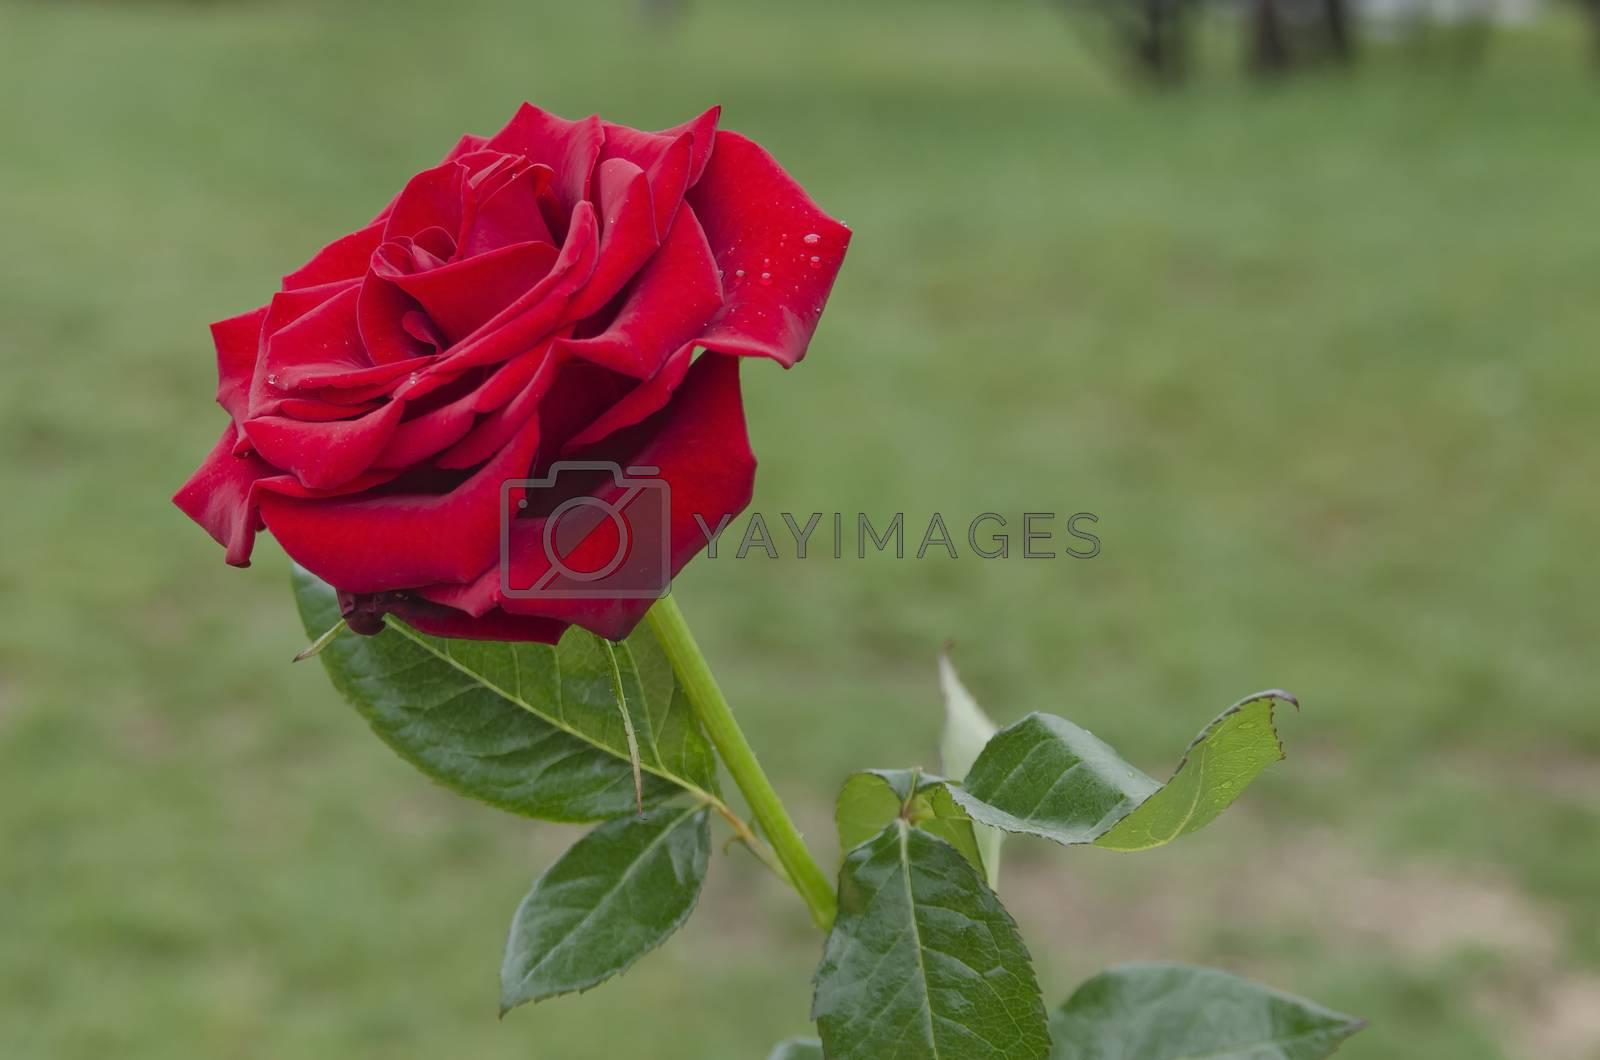 Twig of beauty fragrant velvety red rose